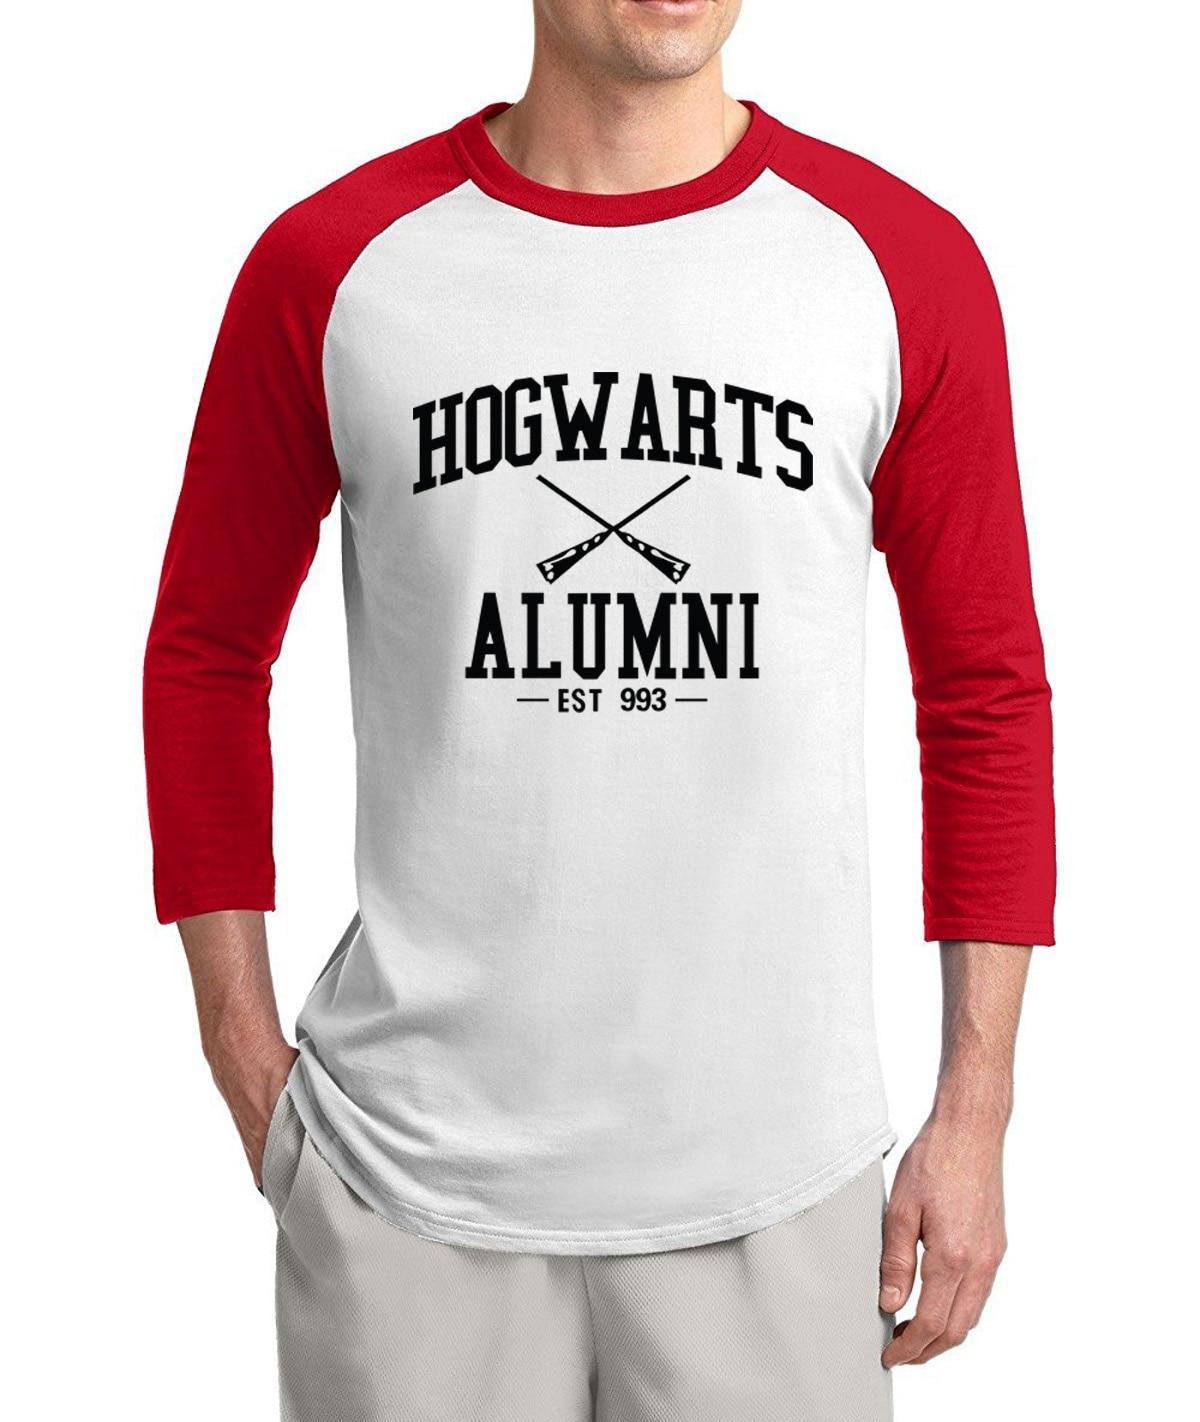 Hogwarts Inspired Magic Alumni 3/4 sleeve t shirts men 2017 summer 100% cotton raglan men t-shirt o-neck top tees for movie fans